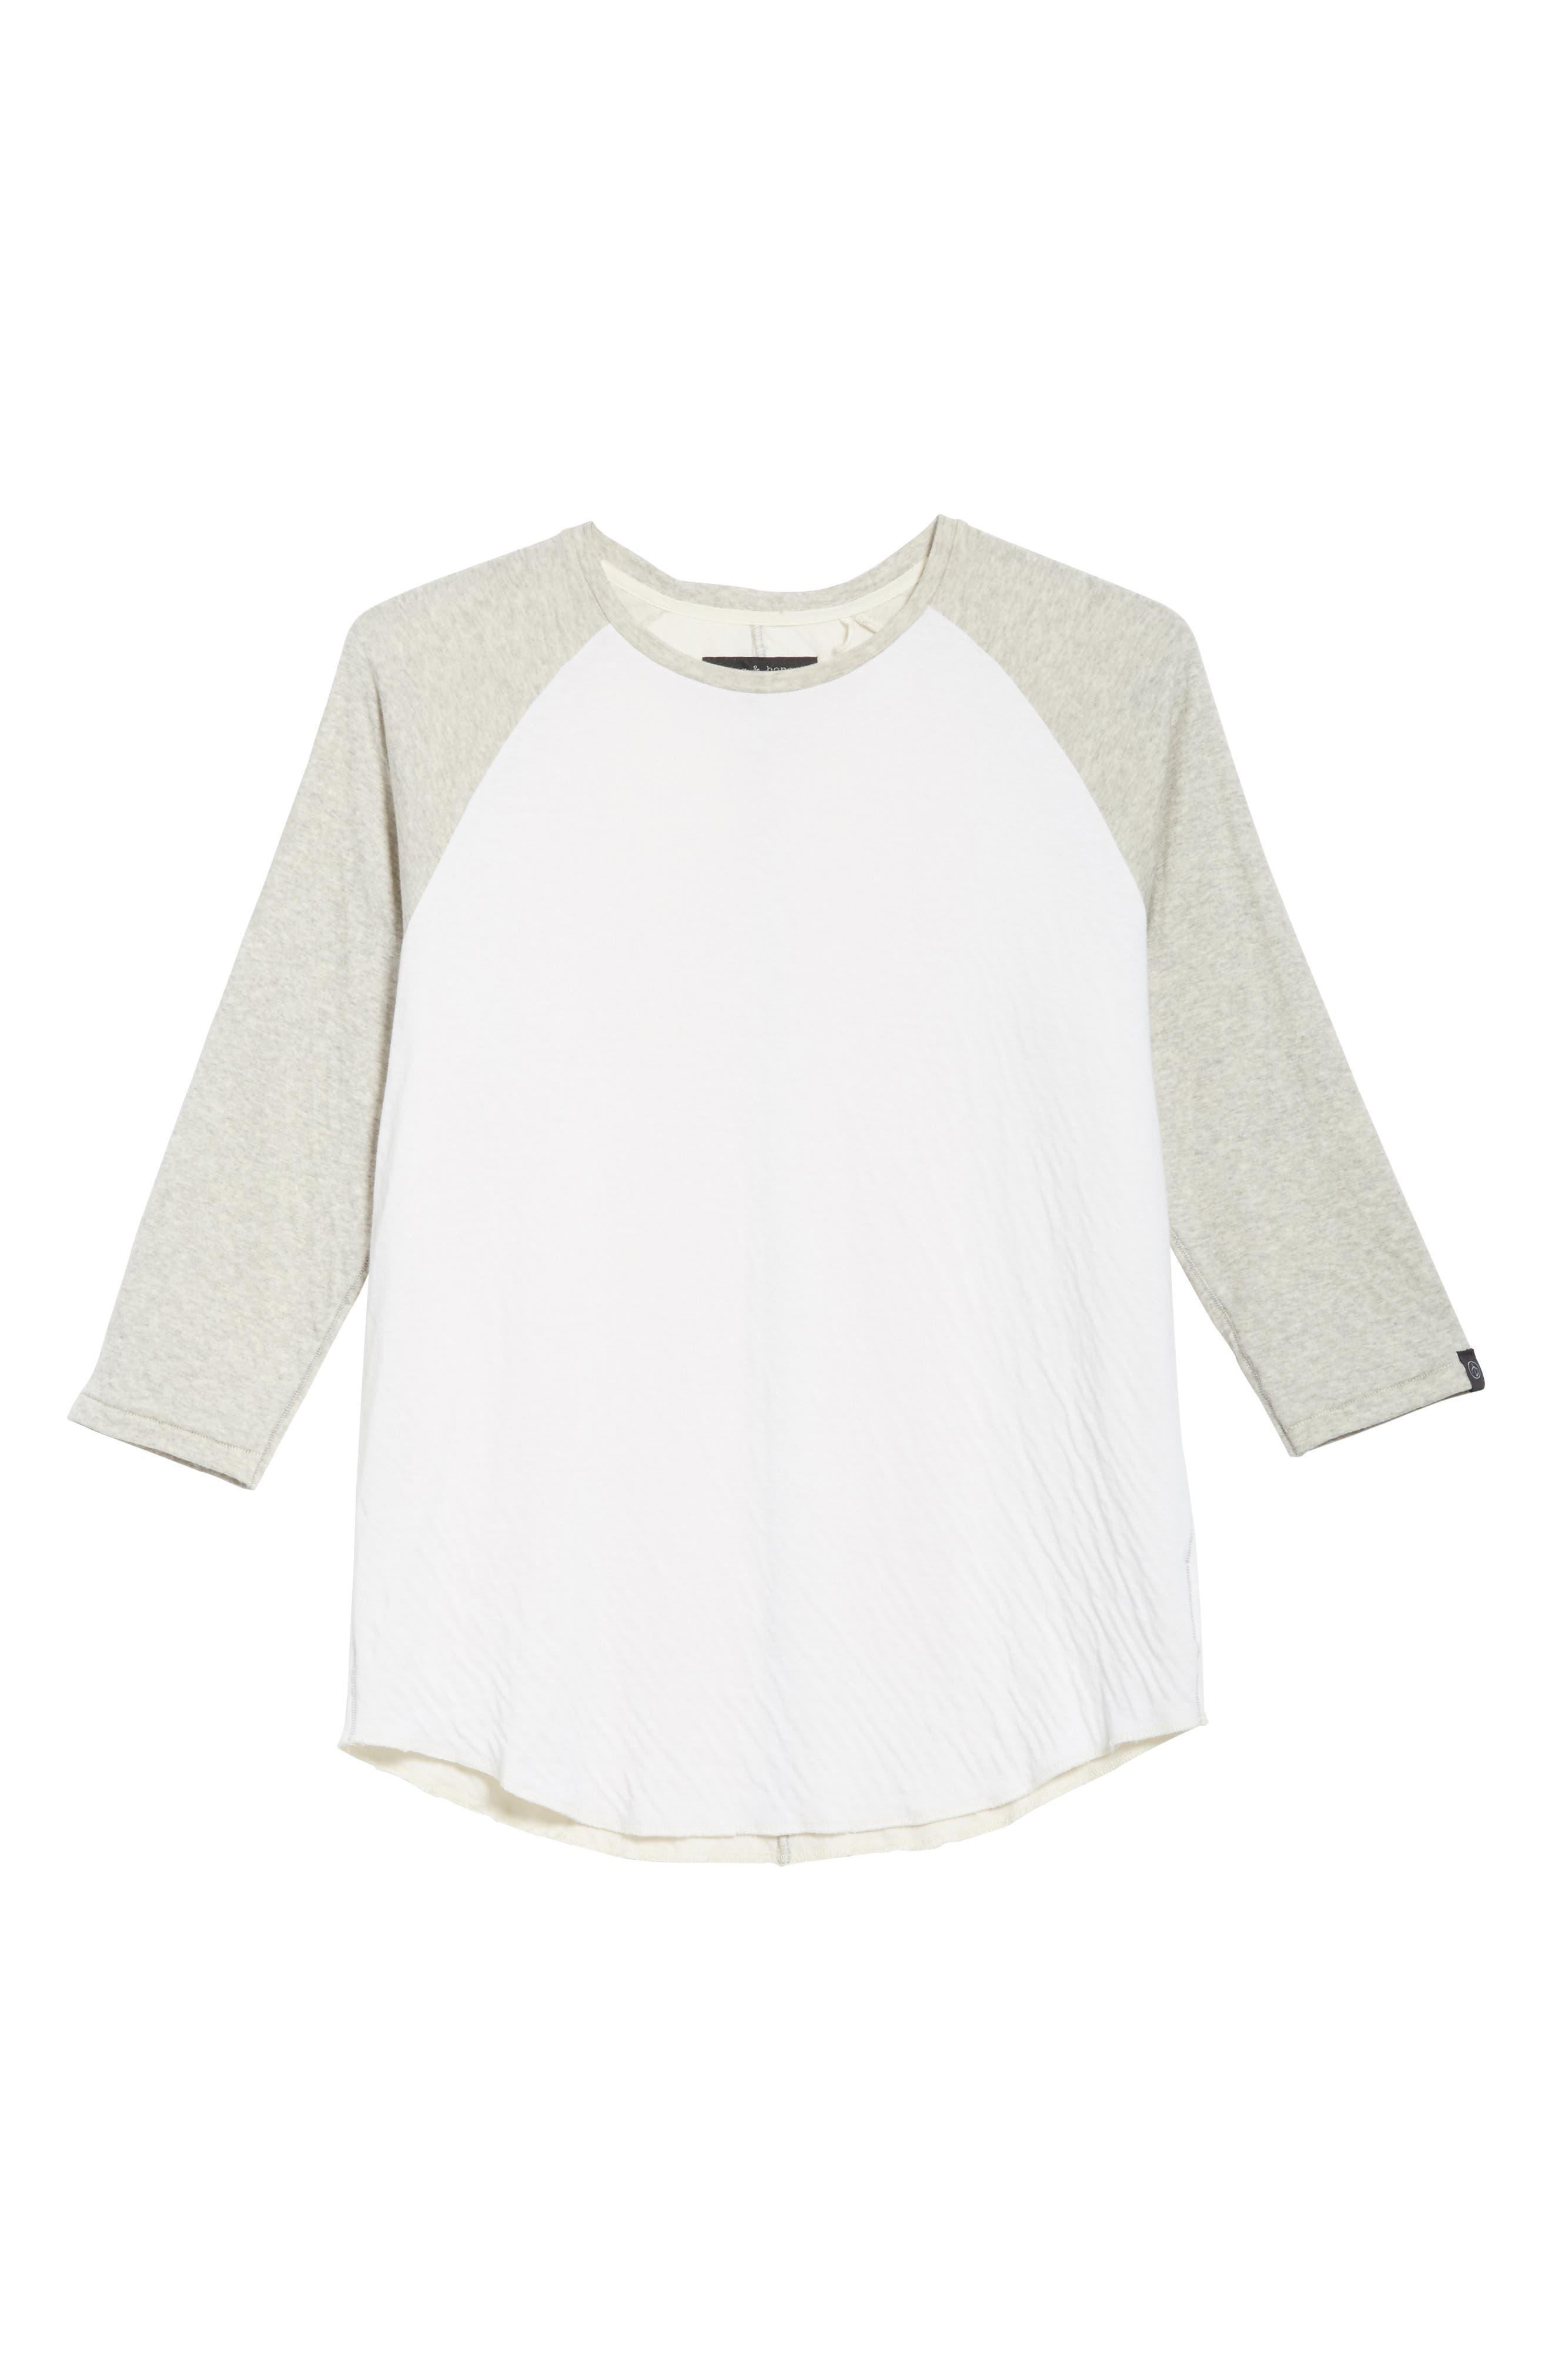 Rigby Baseball T-Shirt,                             Alternate thumbnail 6, color,                             Grey/ White